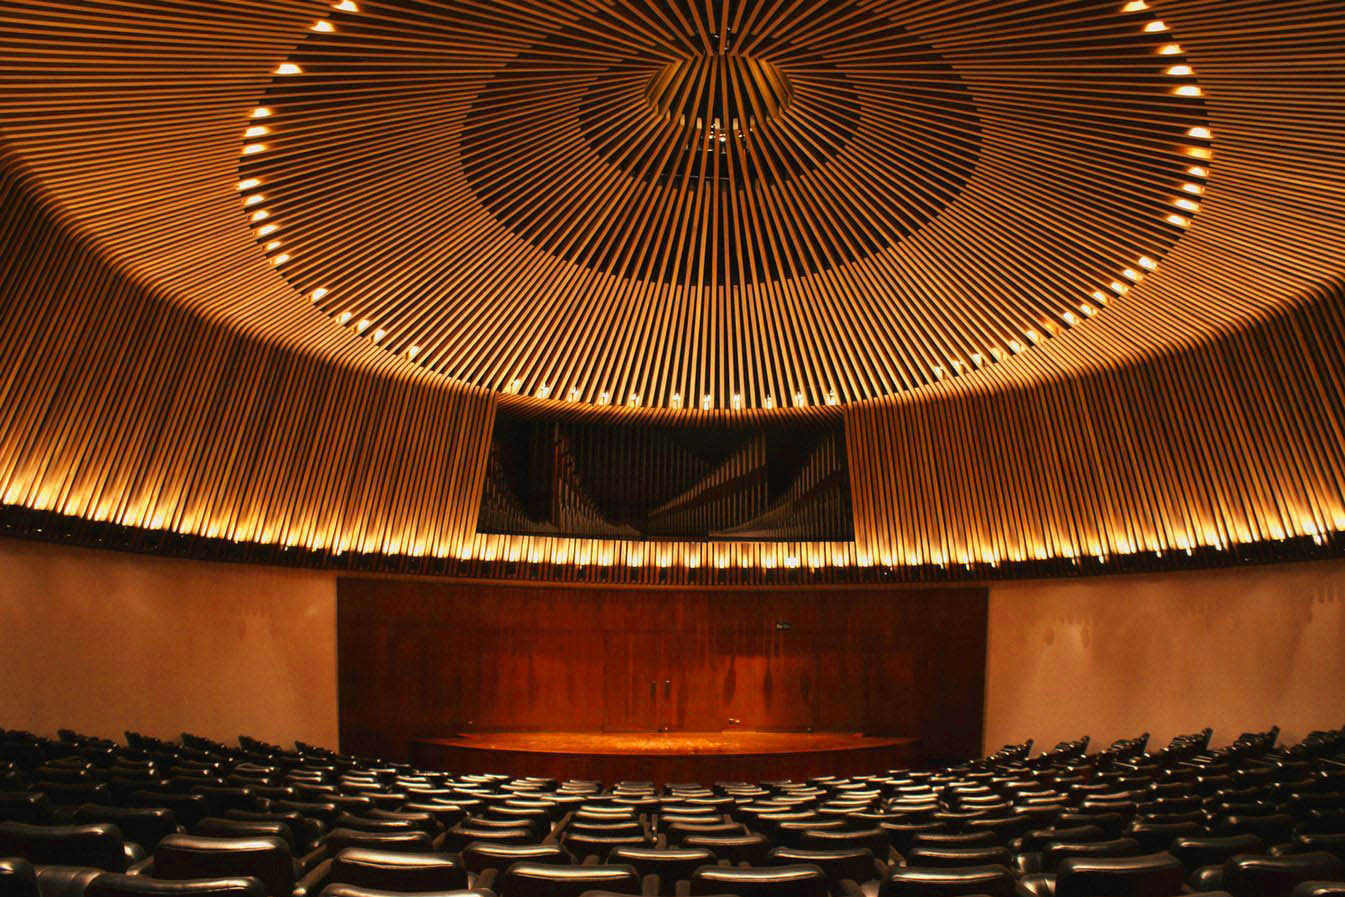 Optina Pustyn male choir. Sala de conciertos de la biblioteca luis angel arango. Bogota